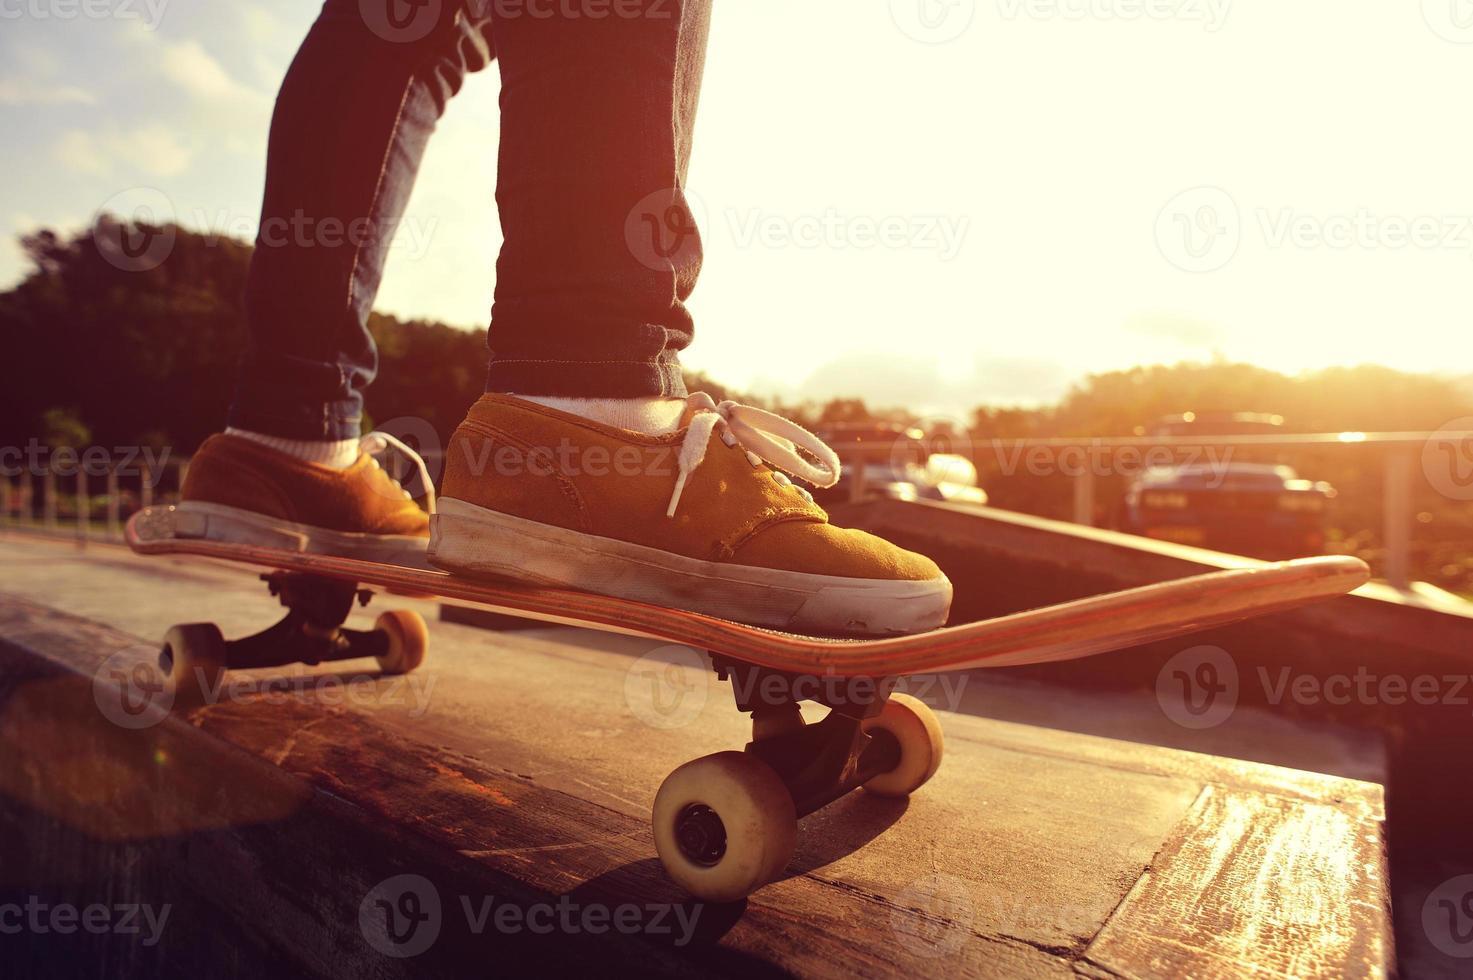 skate pernas nascer do sol skatepark foto